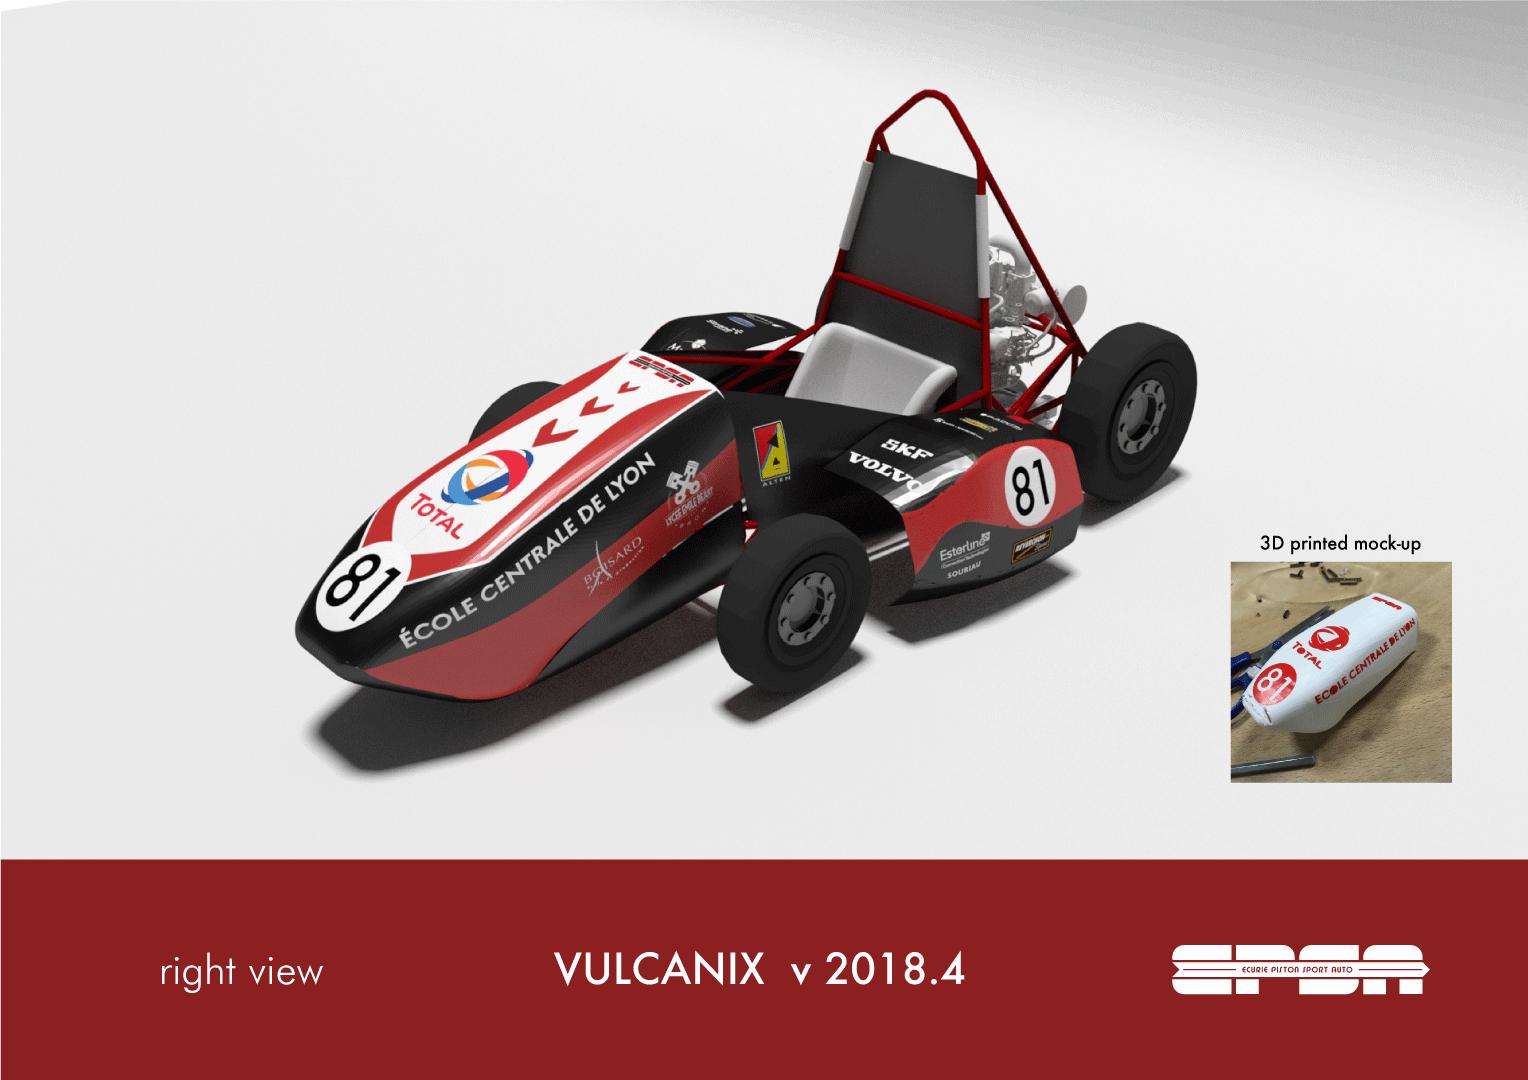 Vulcanix_2018.4_c